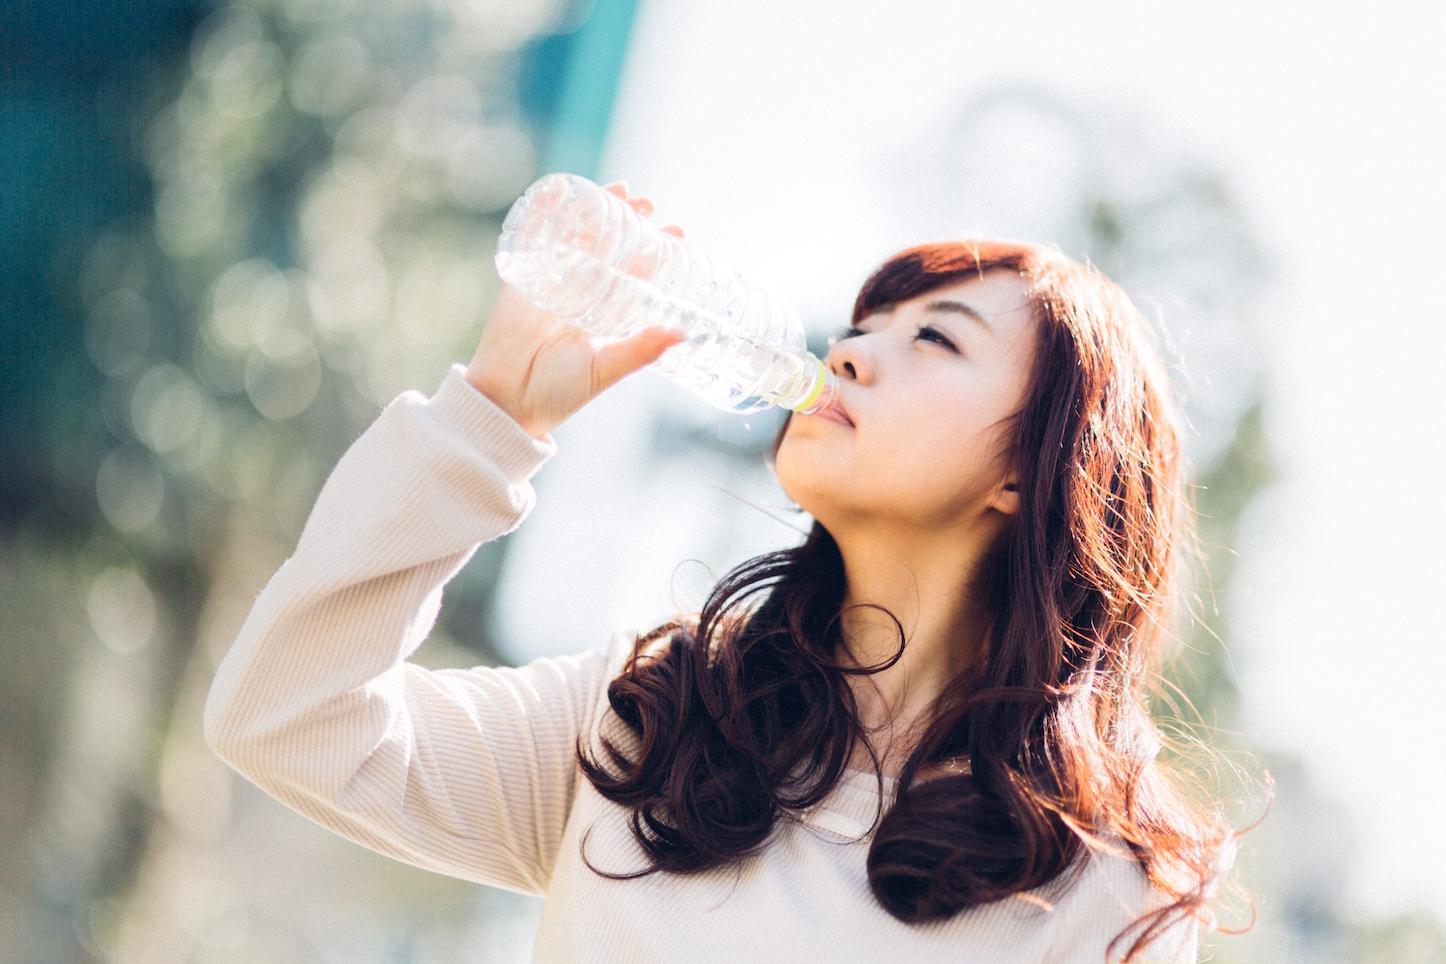 Yuka drinking water from bottle